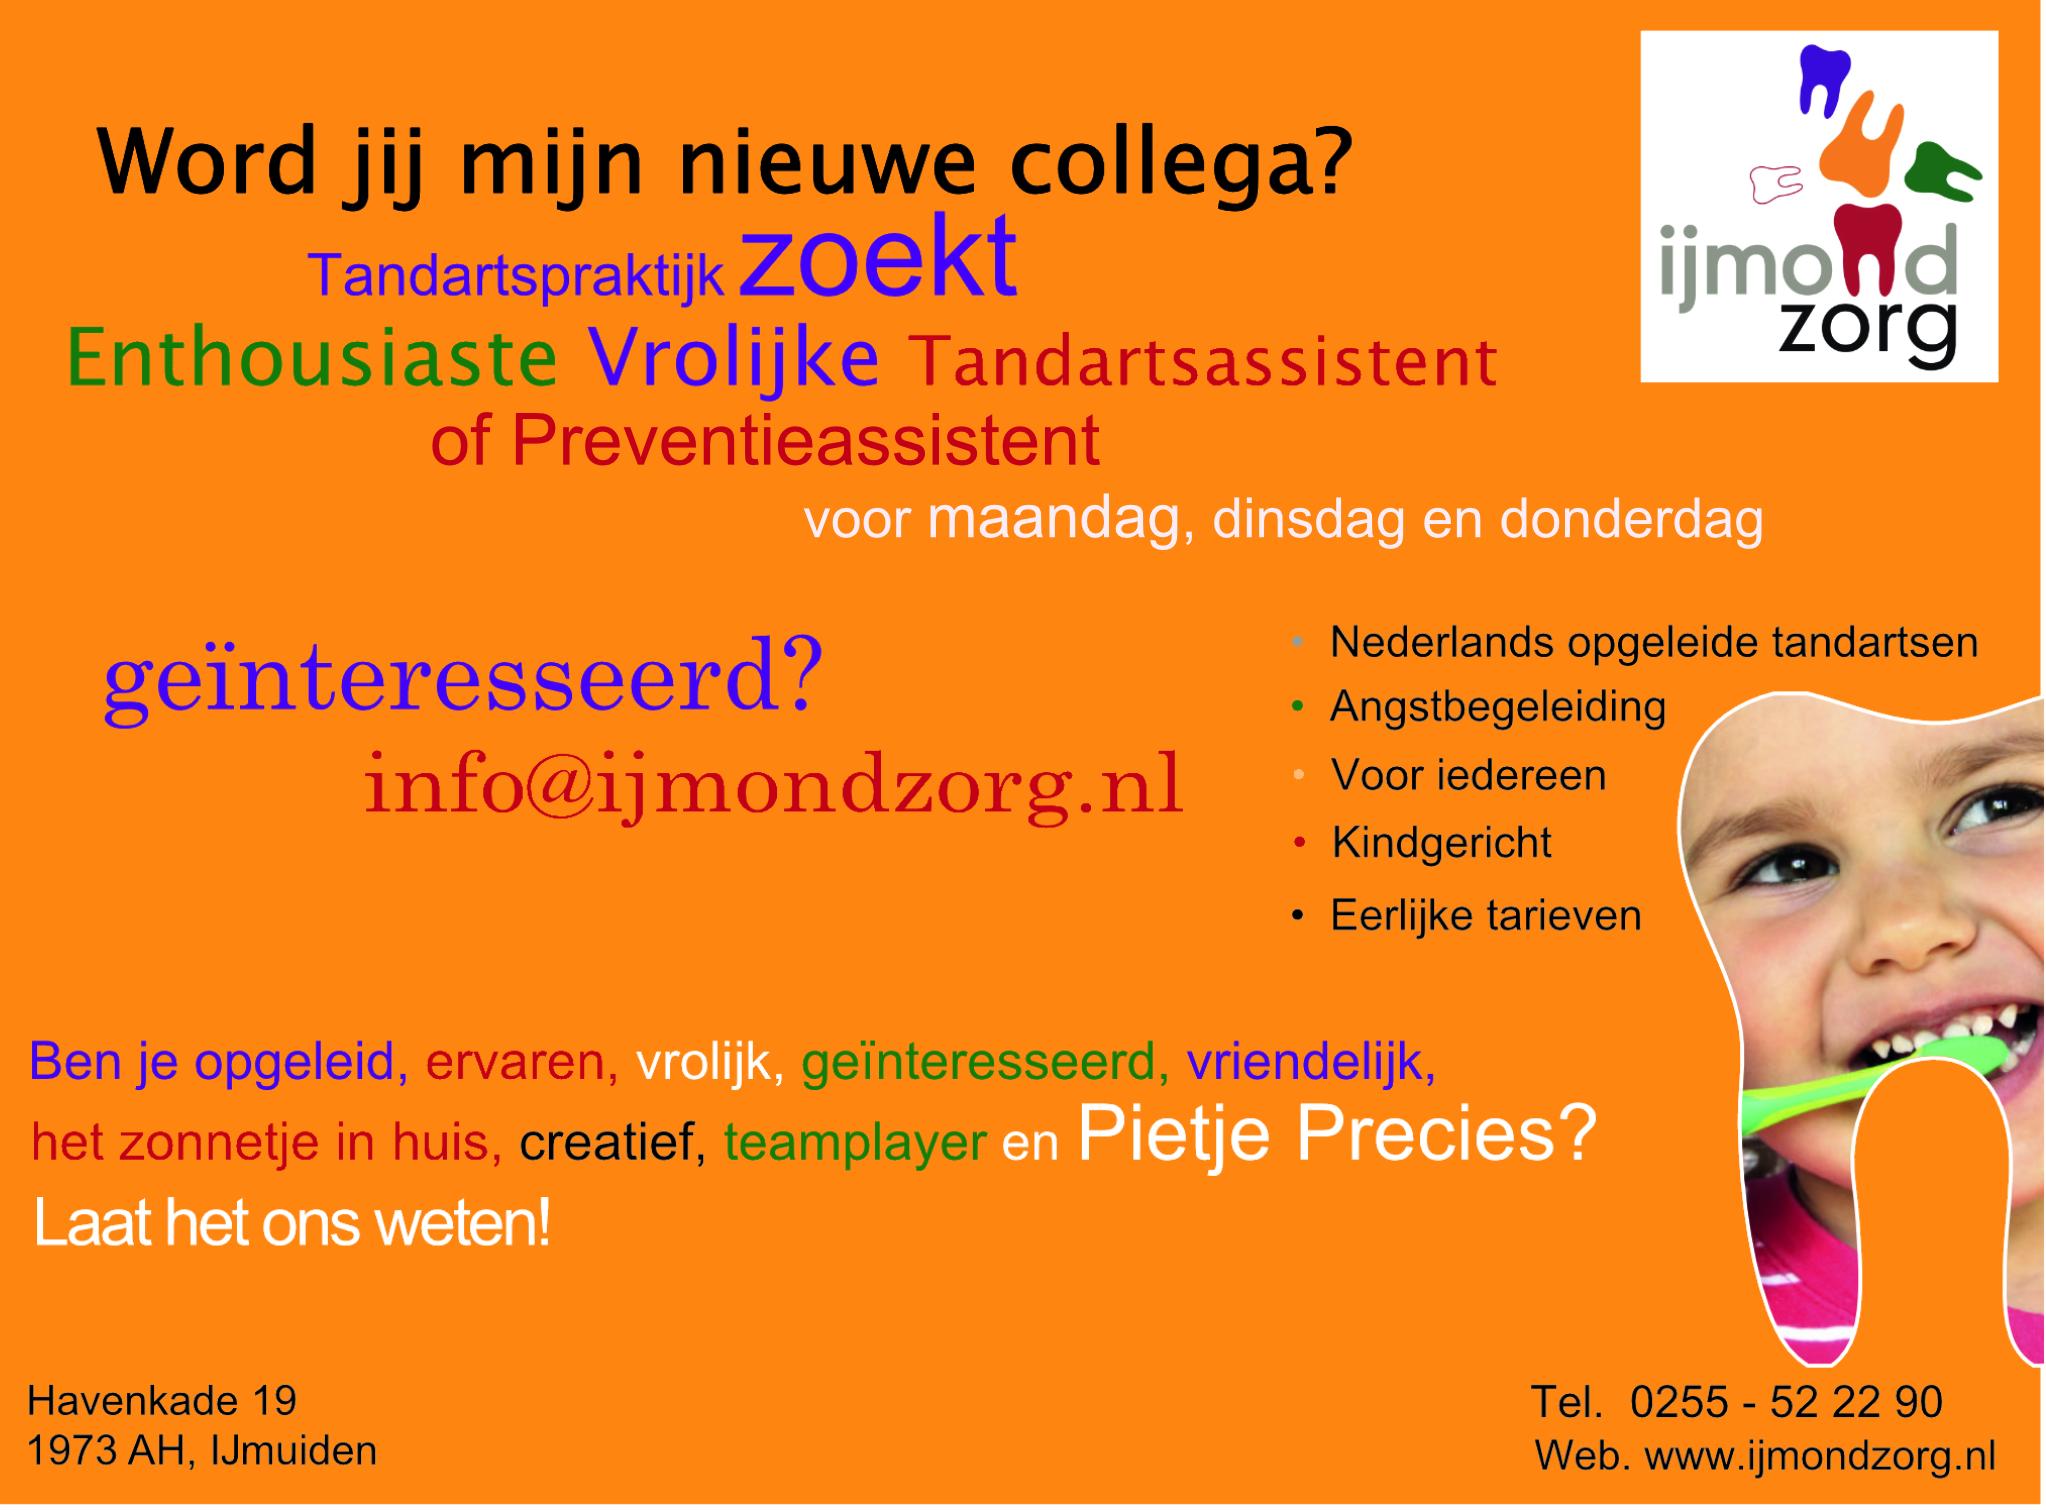 IJmondzorg, Vacature tandartsassistent/preventieassistent